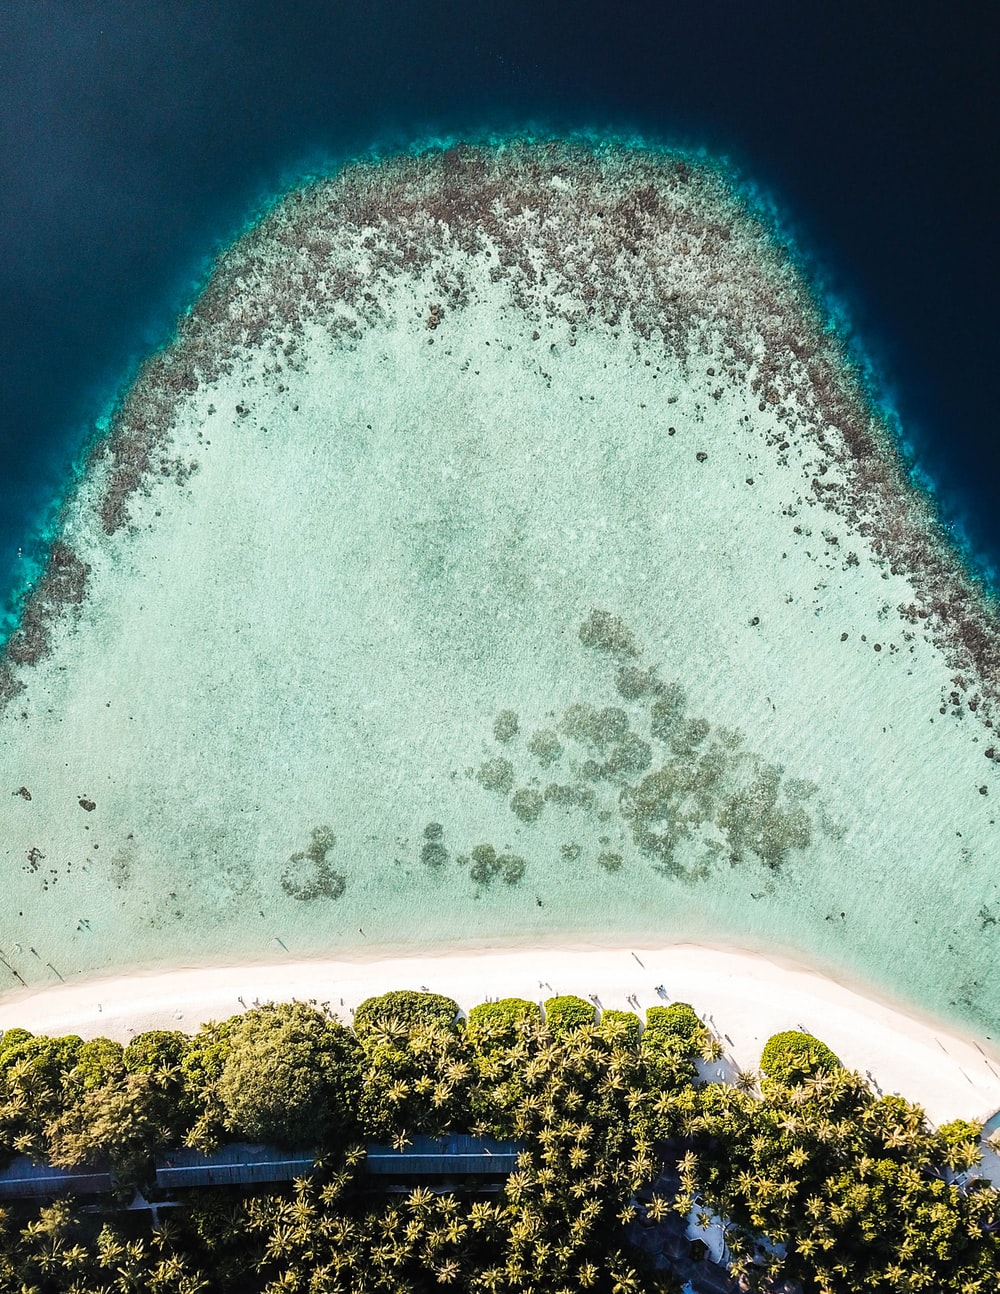 high-angle photography of trees and sand